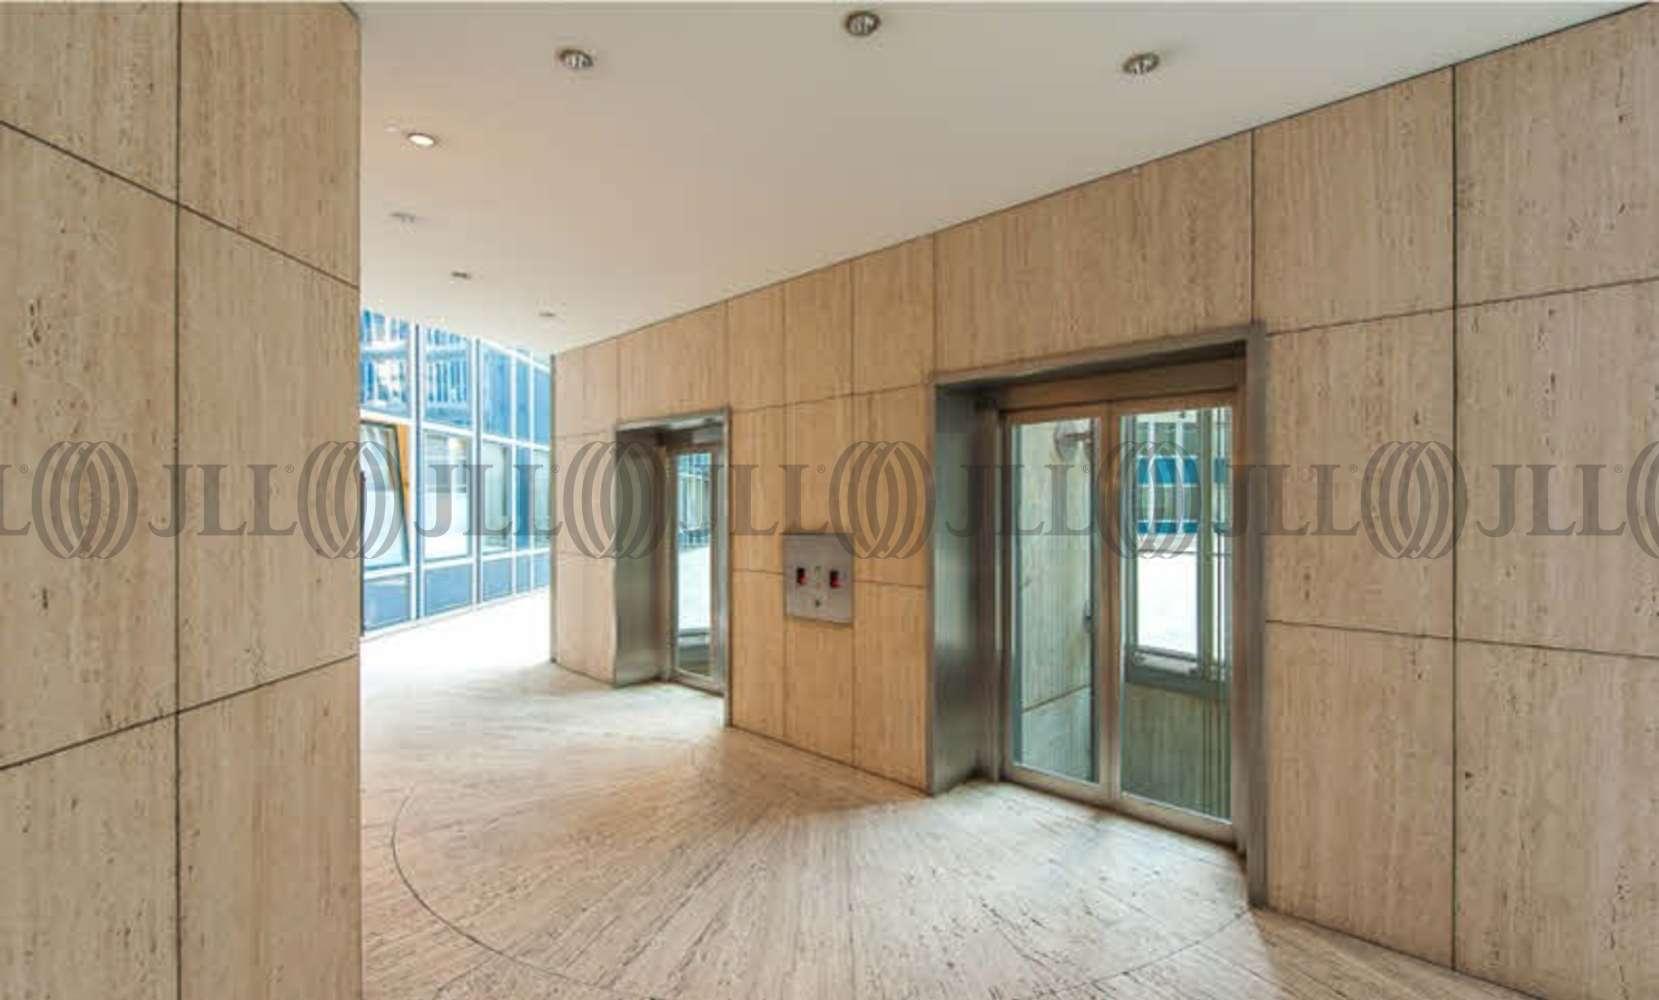 Büros Hamburg, 20457 - Büro - Hamburg, Altstadt - H0329 - 9400241